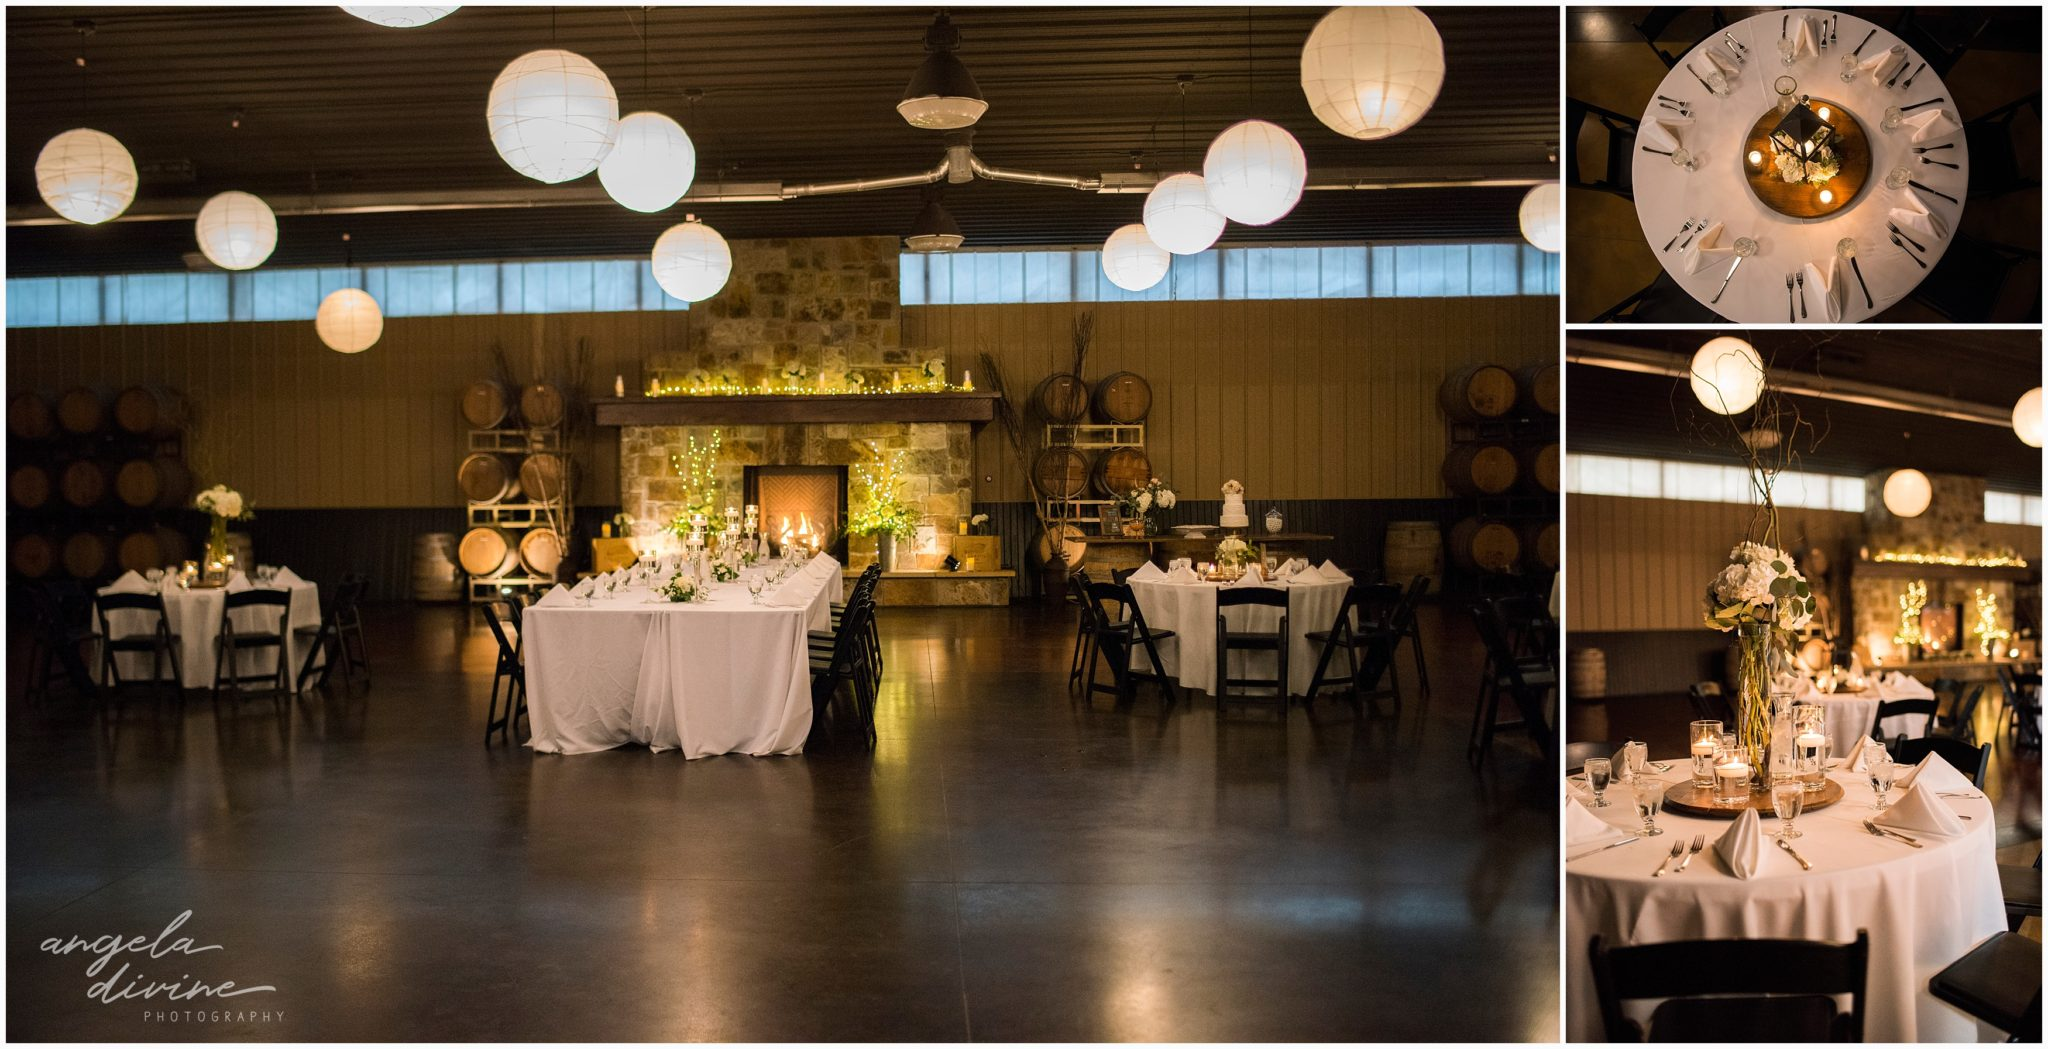 Carlos Creek Winery wedding reception details